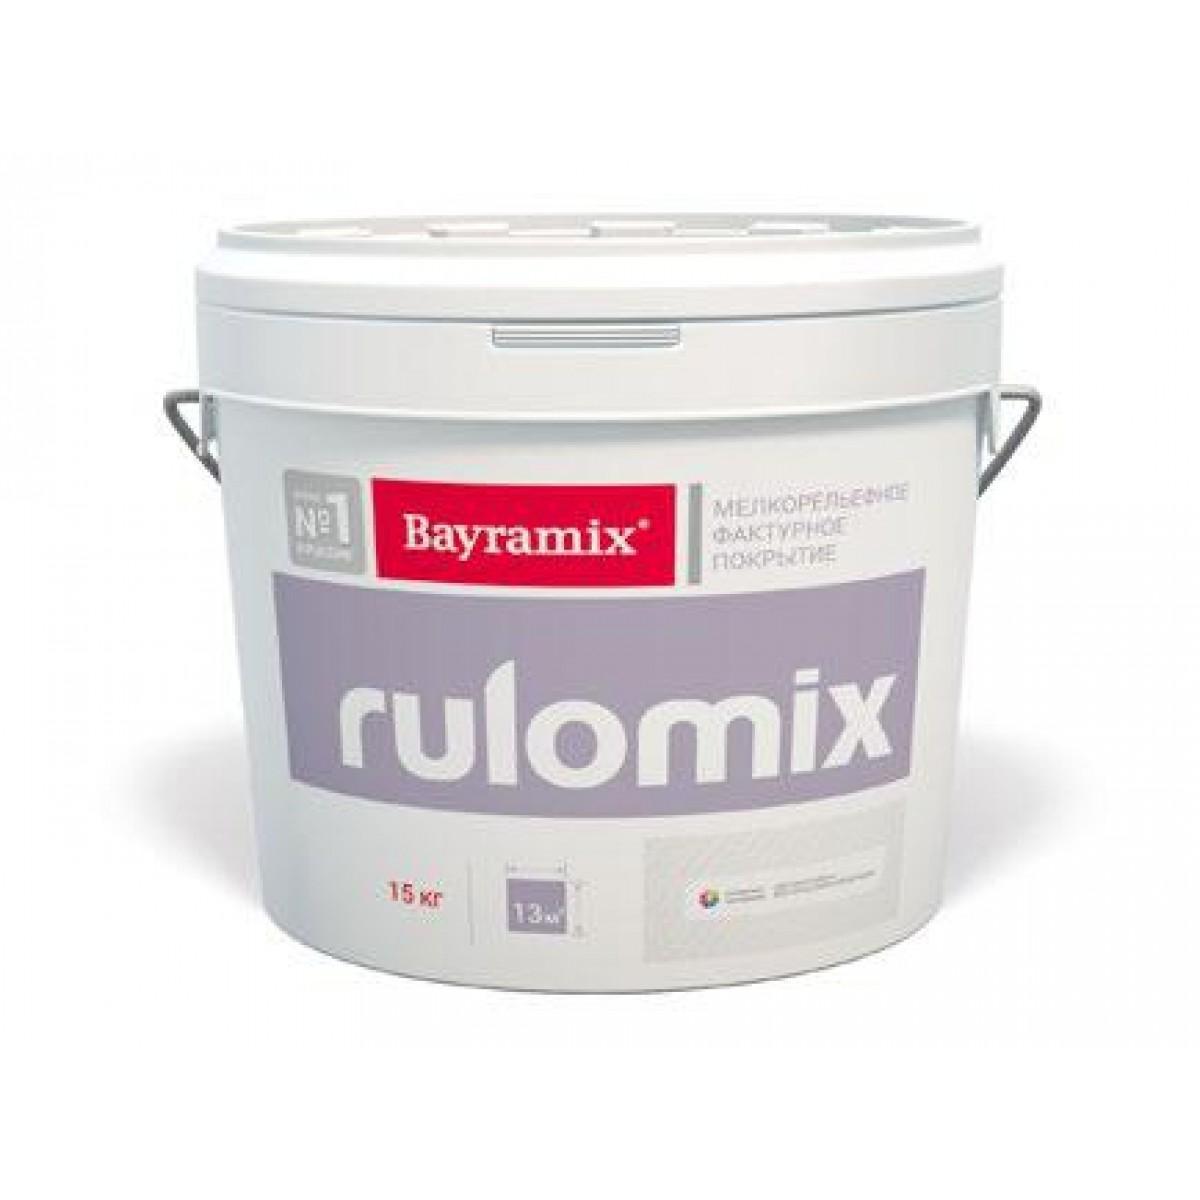 Rulomix